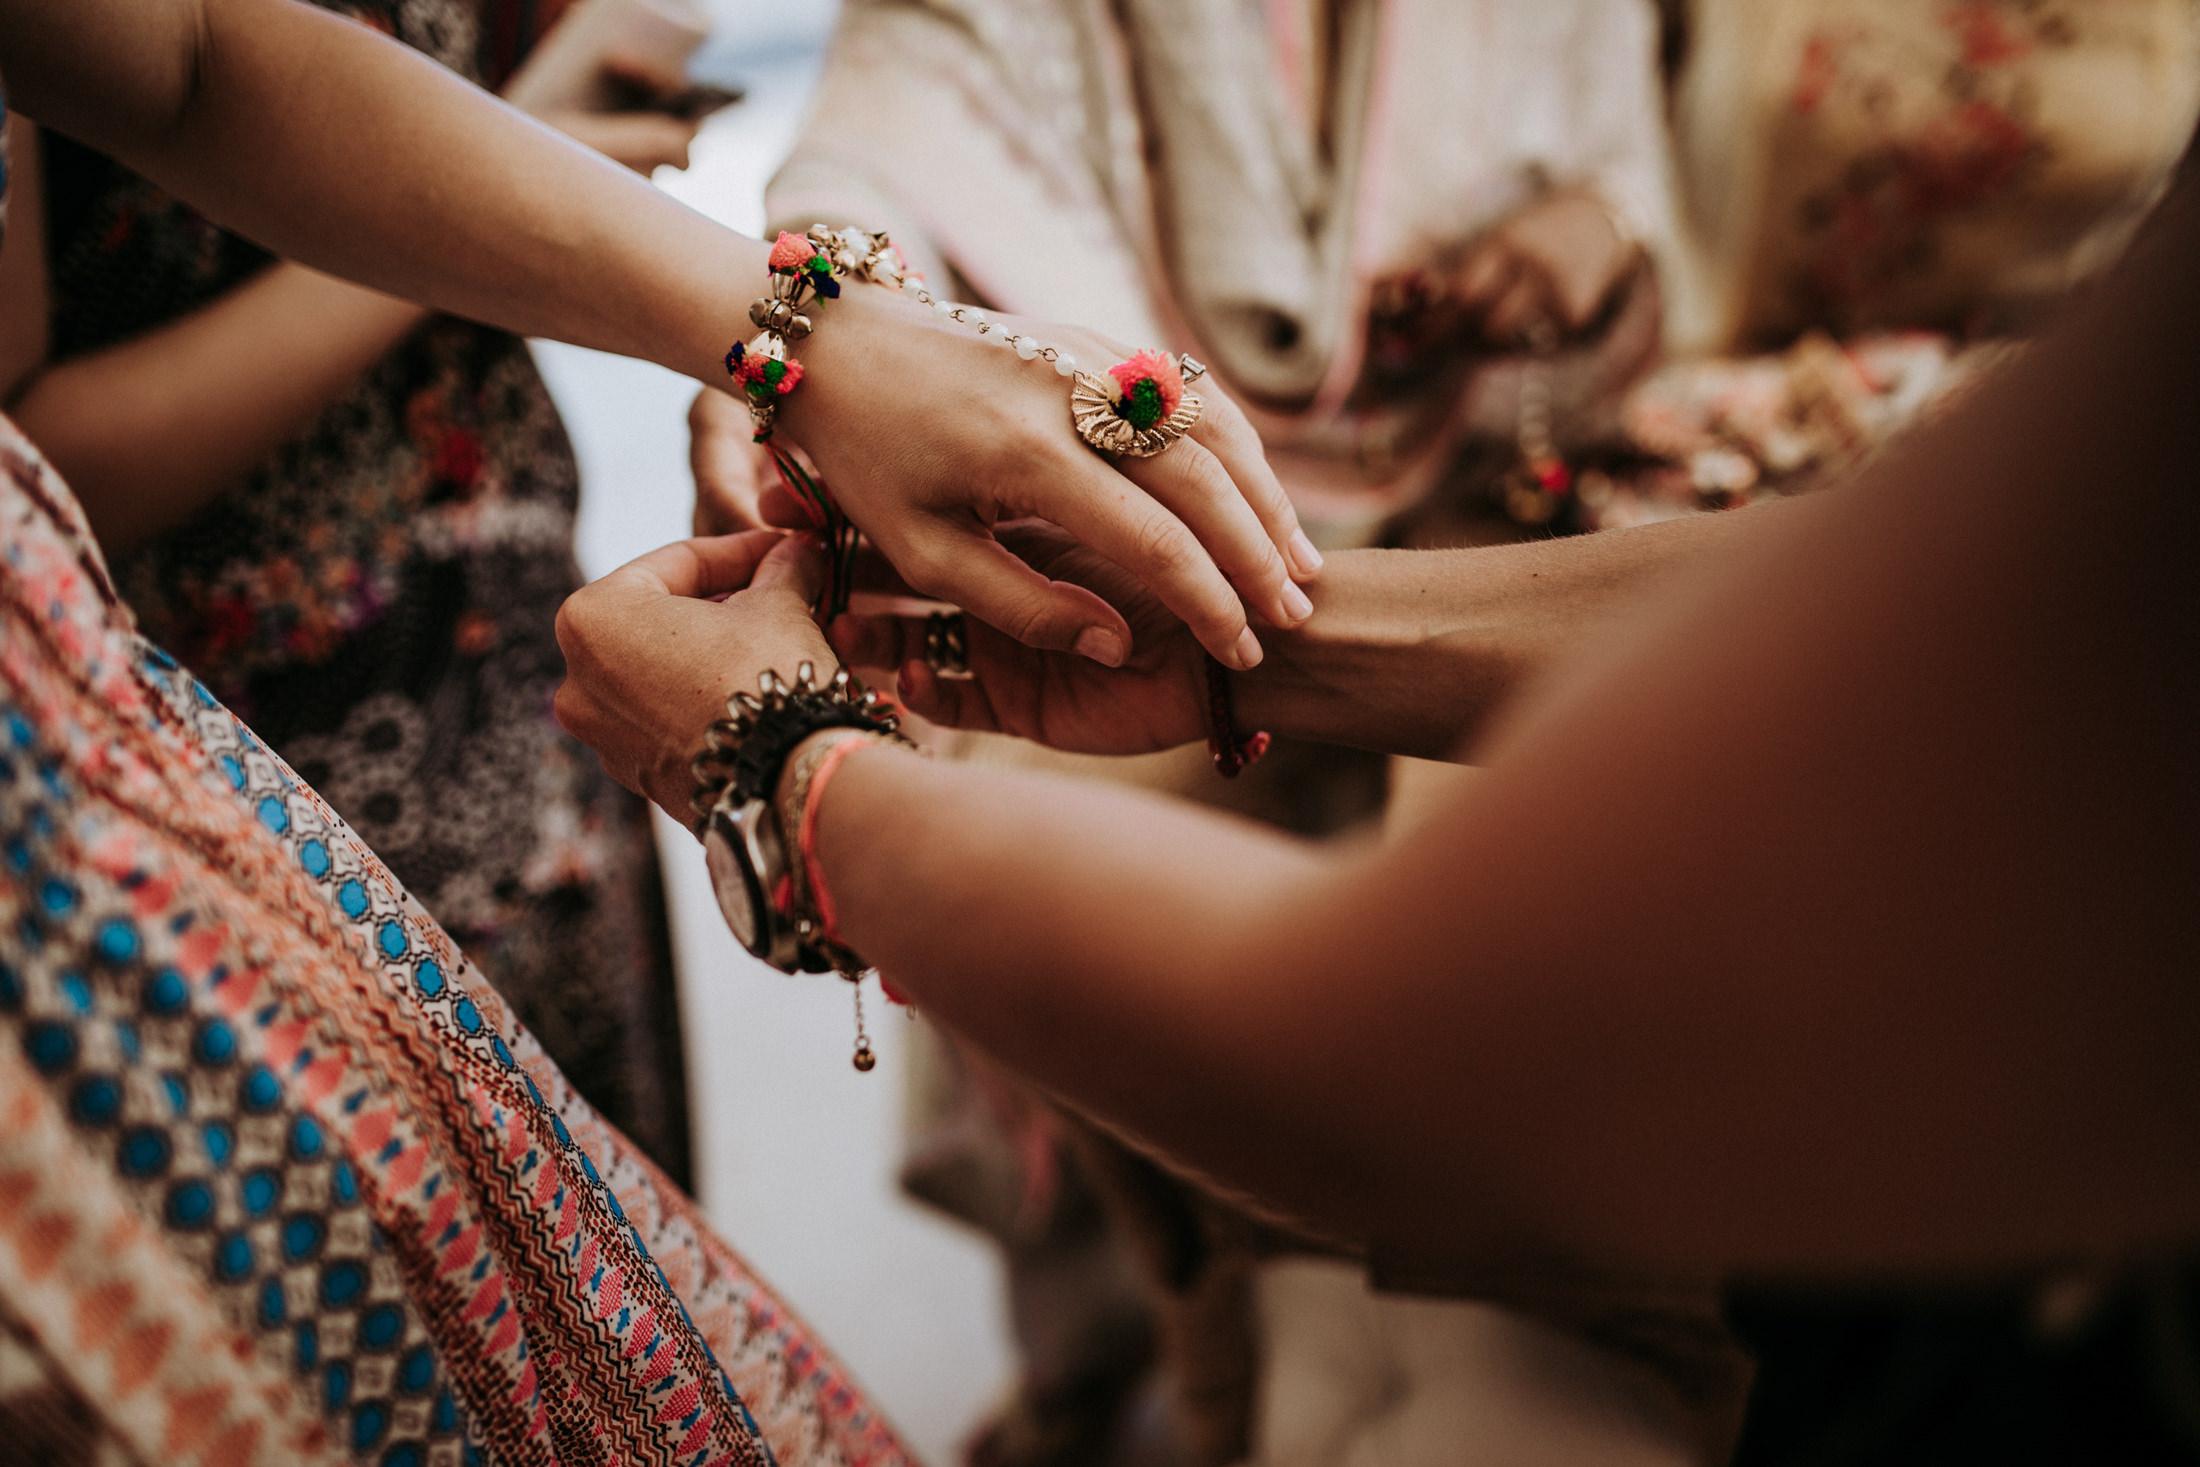 Wedding_Photographer_Mallorca_Daniela-Marquardt_Photography_New_York_Iceland_Tuscany_Santorini_Portugal_Austria_Bavaria_Elopement_Hochzeitsfotograf_AntjeRajat1_13